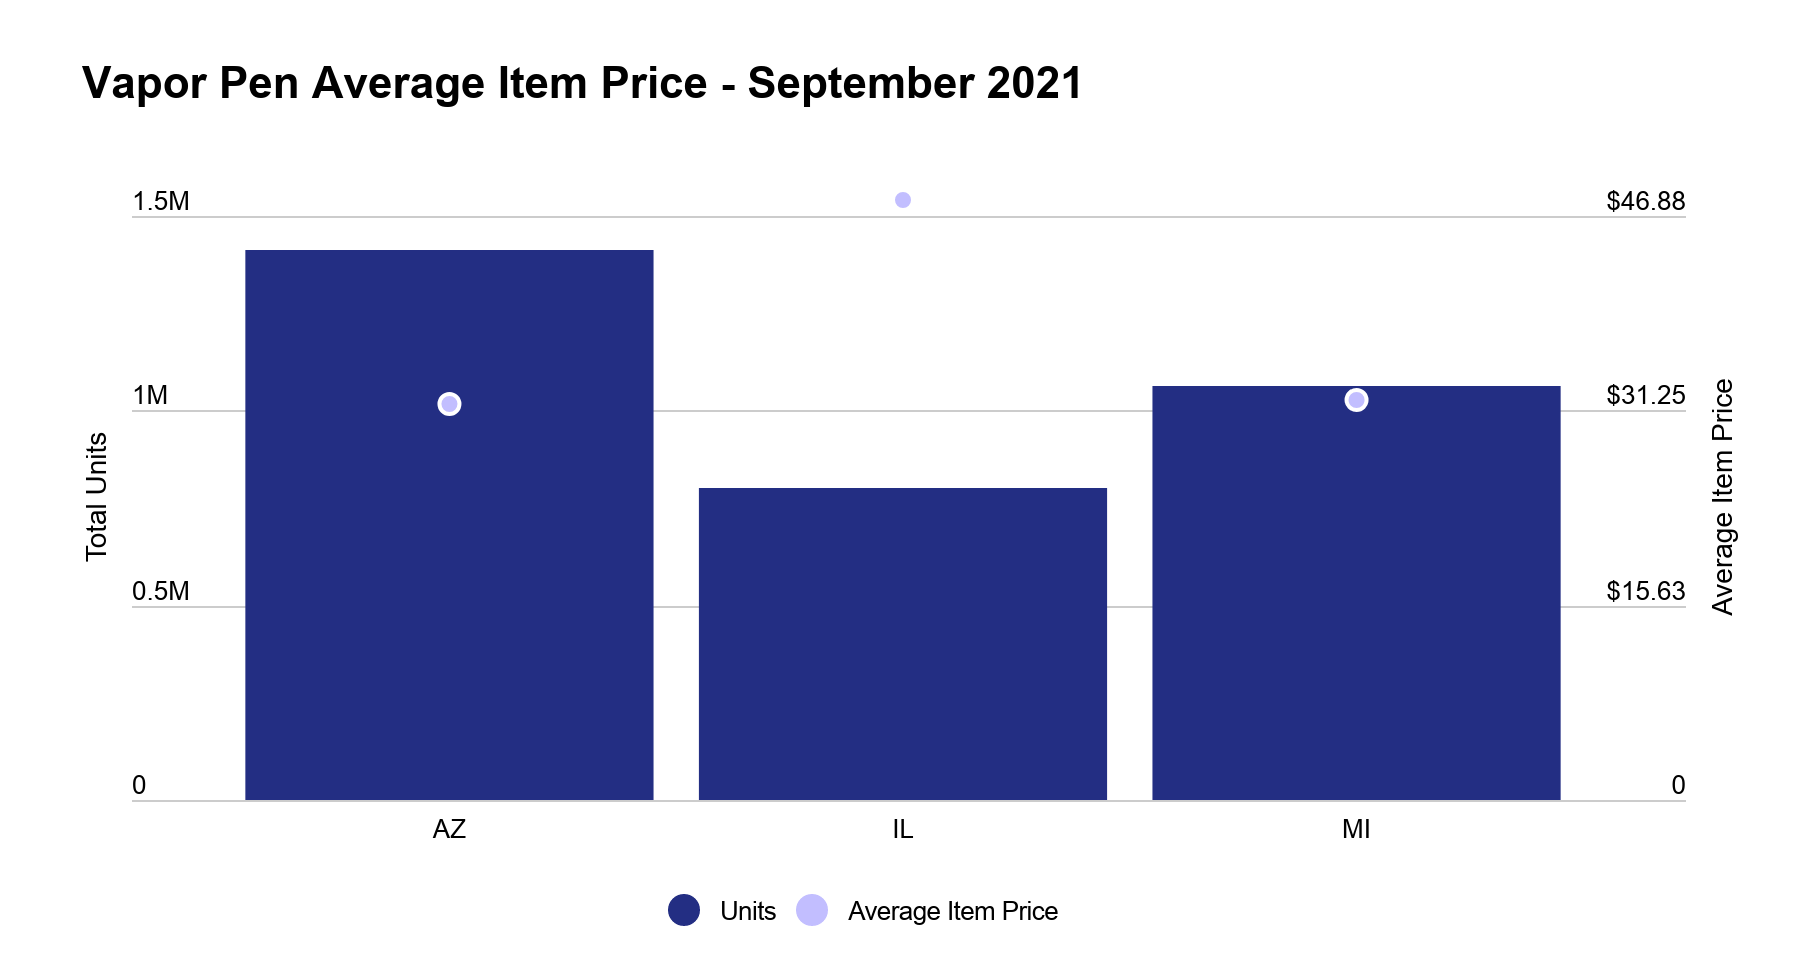 Arizona cannabis market report image 6: Price of cannabis Vapor Pens in Arizona